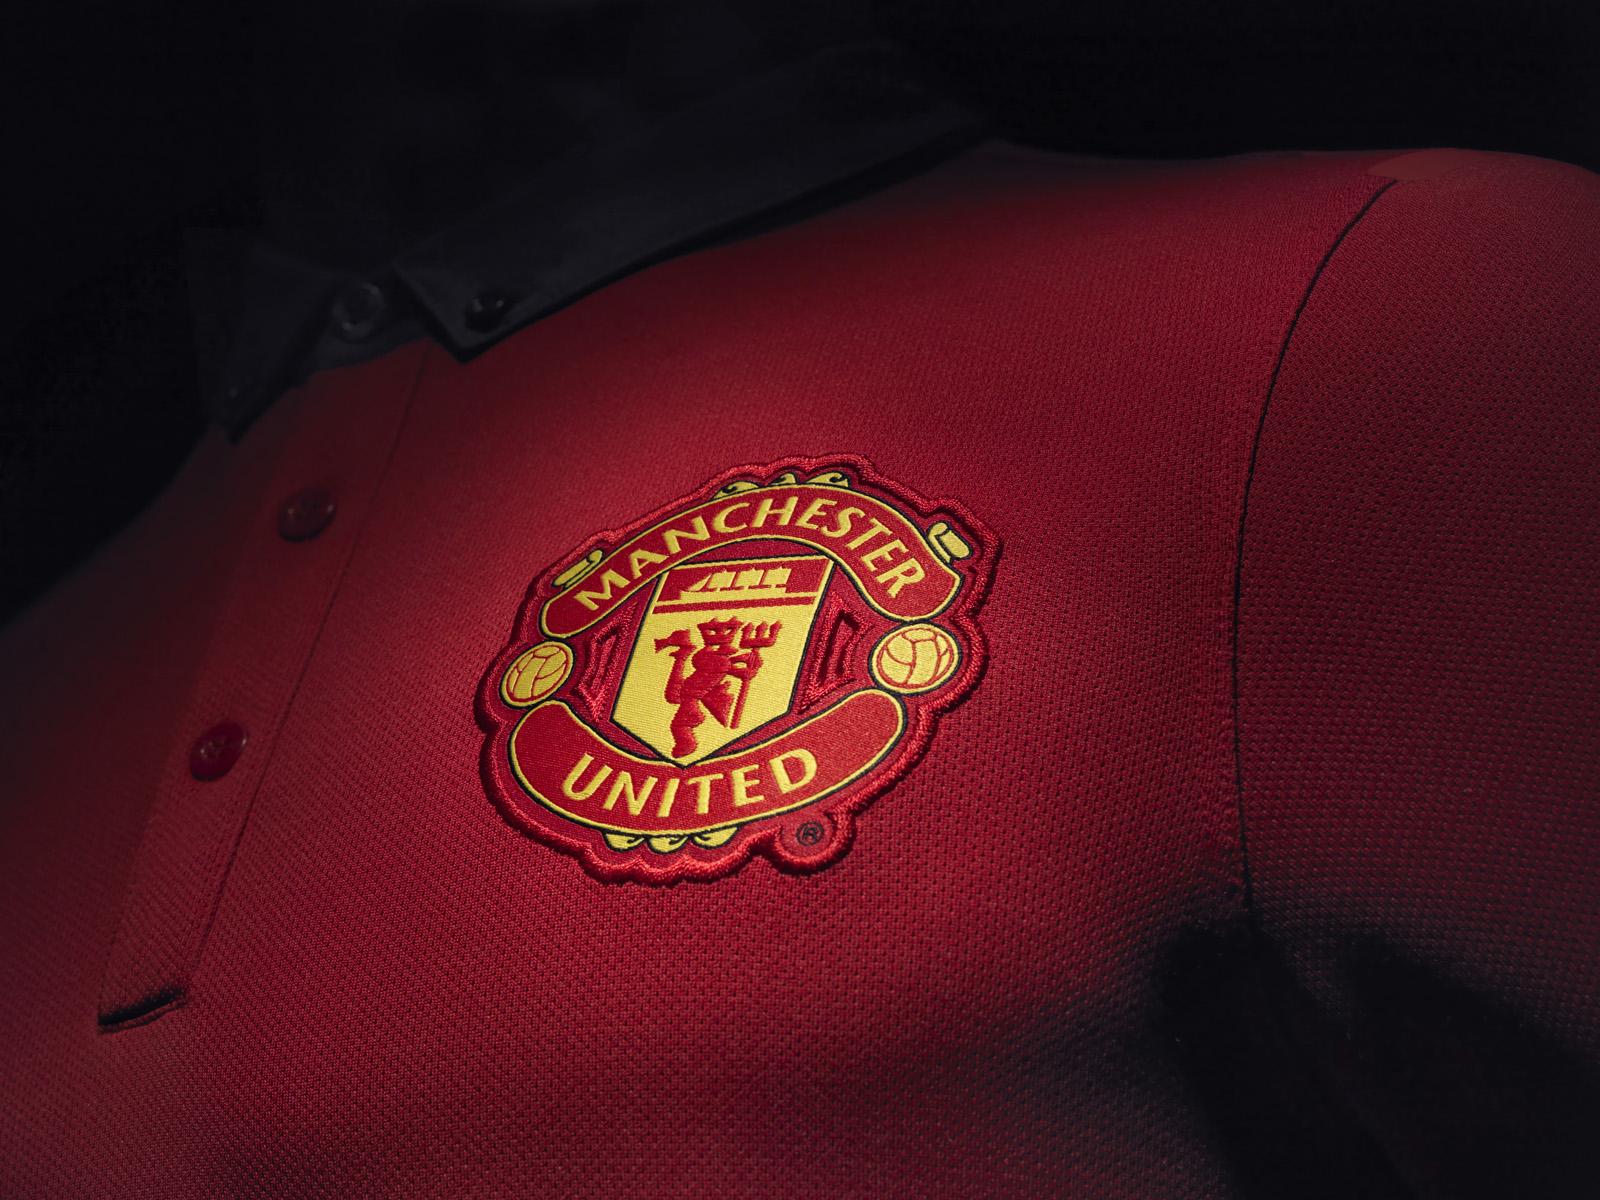 Manchester United presentó su camiseta titular adidas para la temporada 2017/18